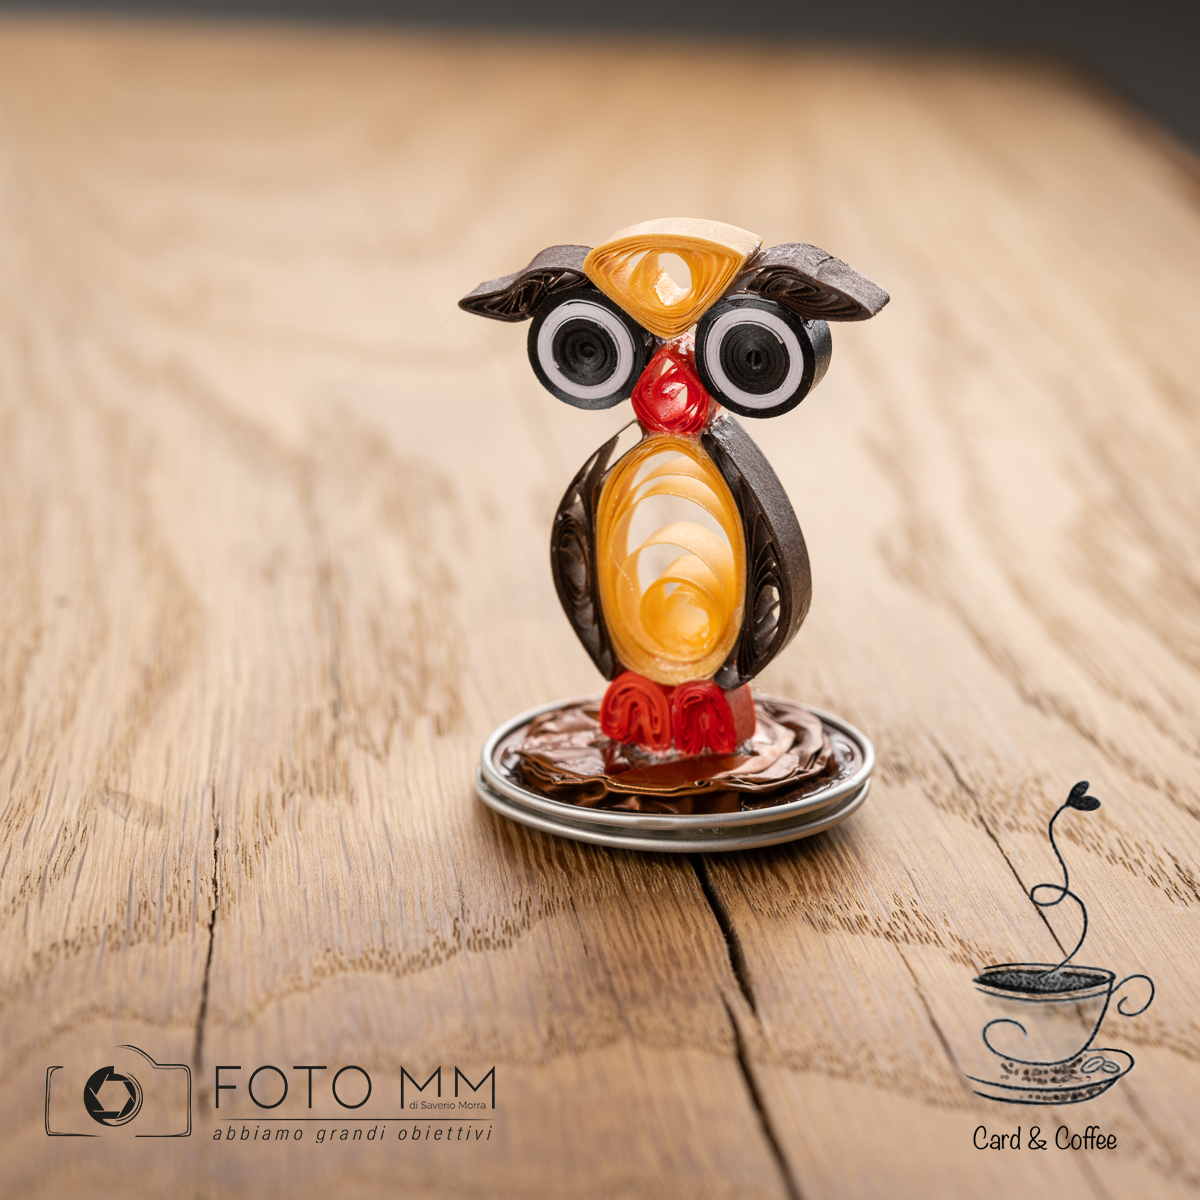 Card & Coffee